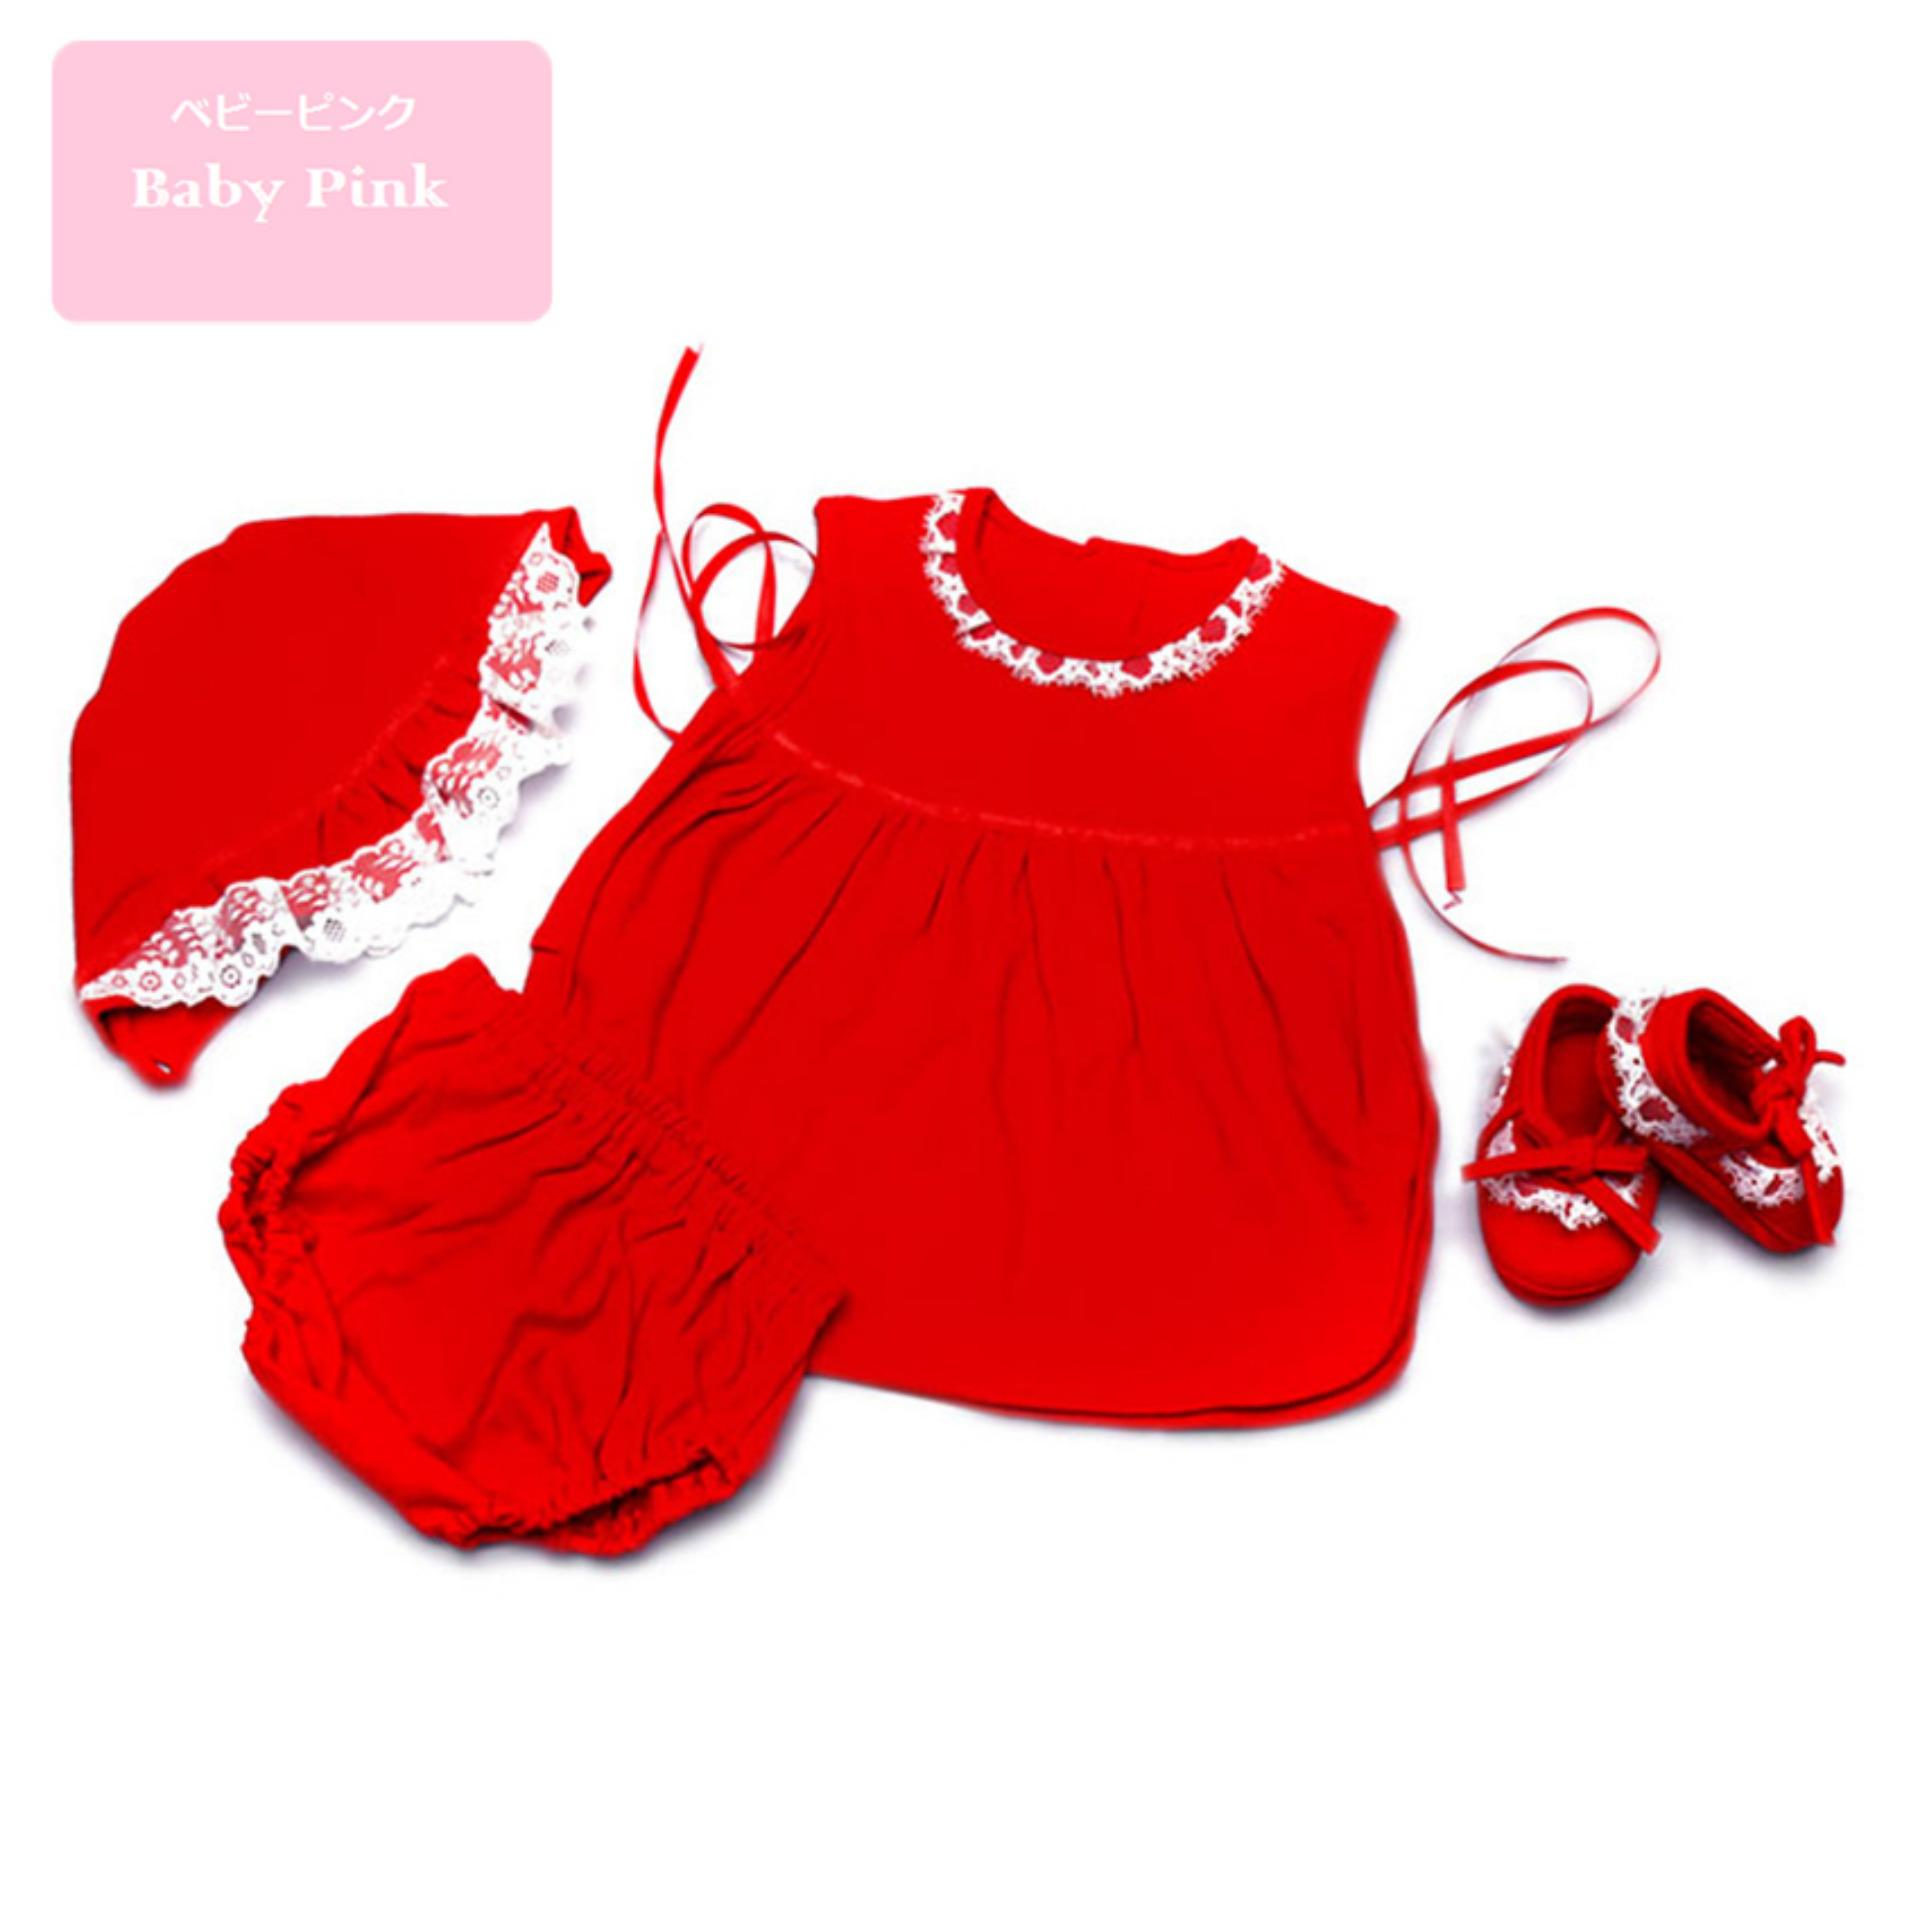 Toko Baby Pink Newborn Babydoll Set Red Online Di Sulawesi Selatan